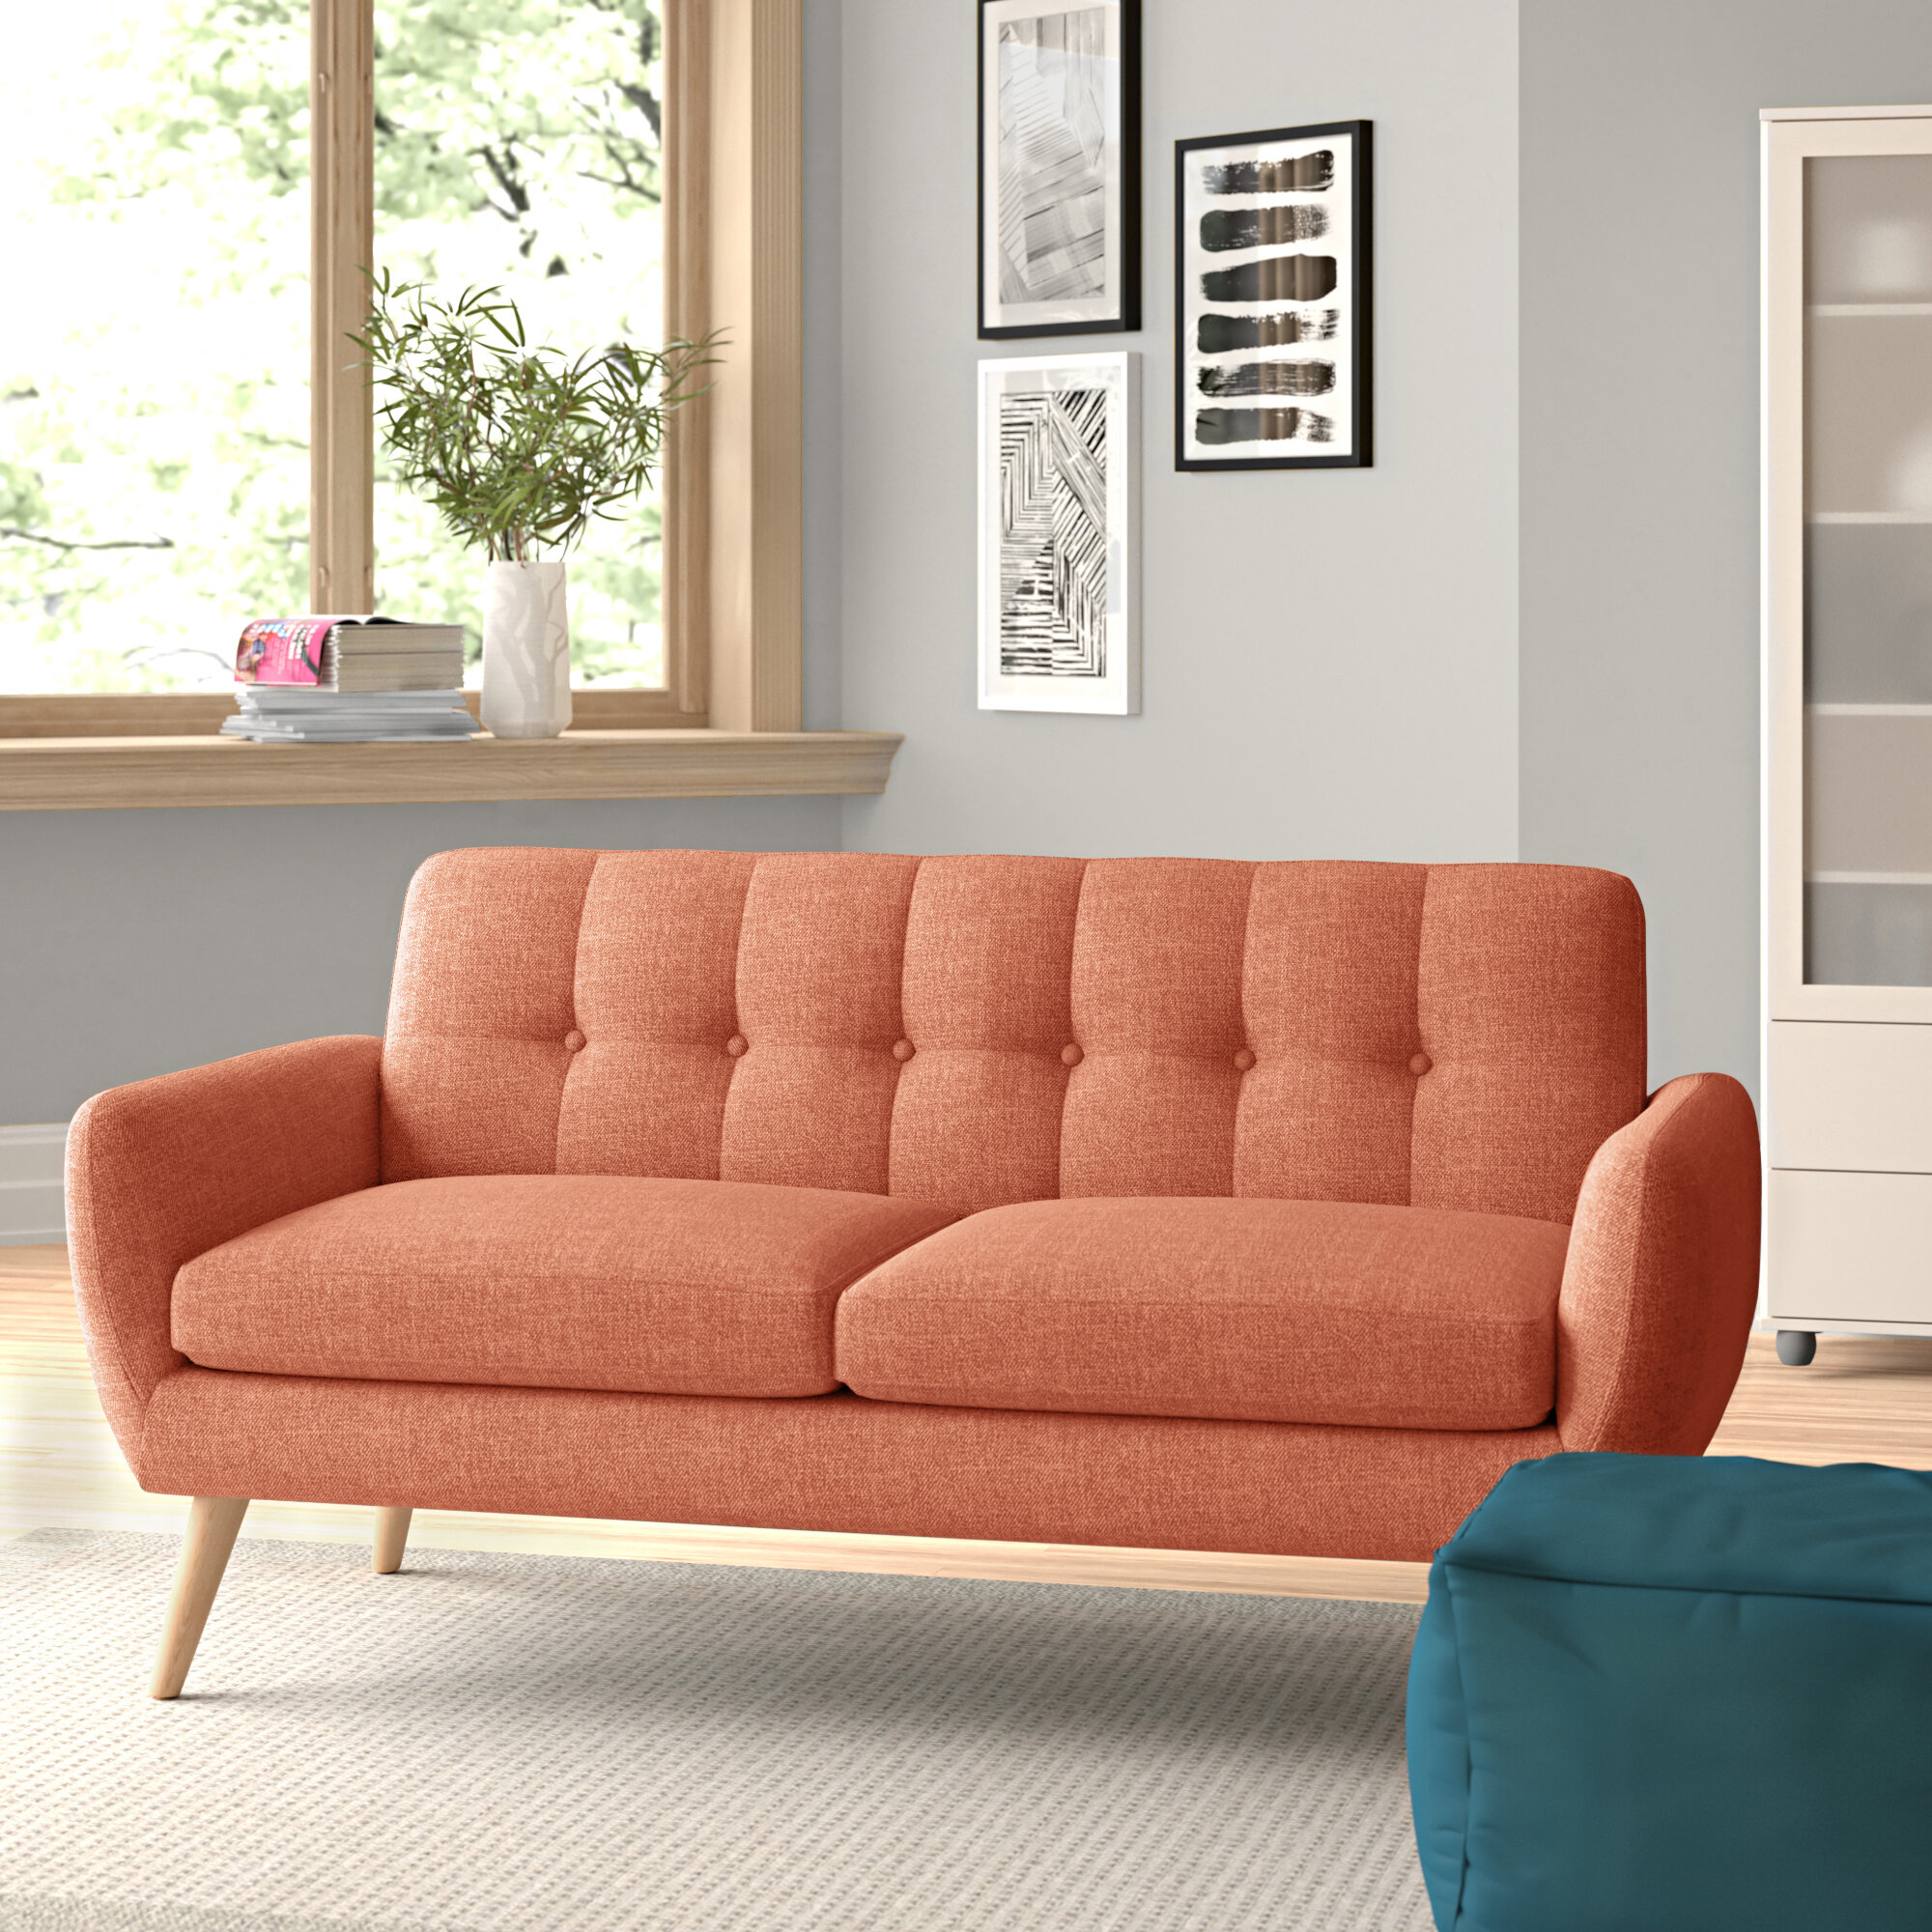 Loveseat Modern Contemporary Sofas You Ll Love In 2020 Wayfair